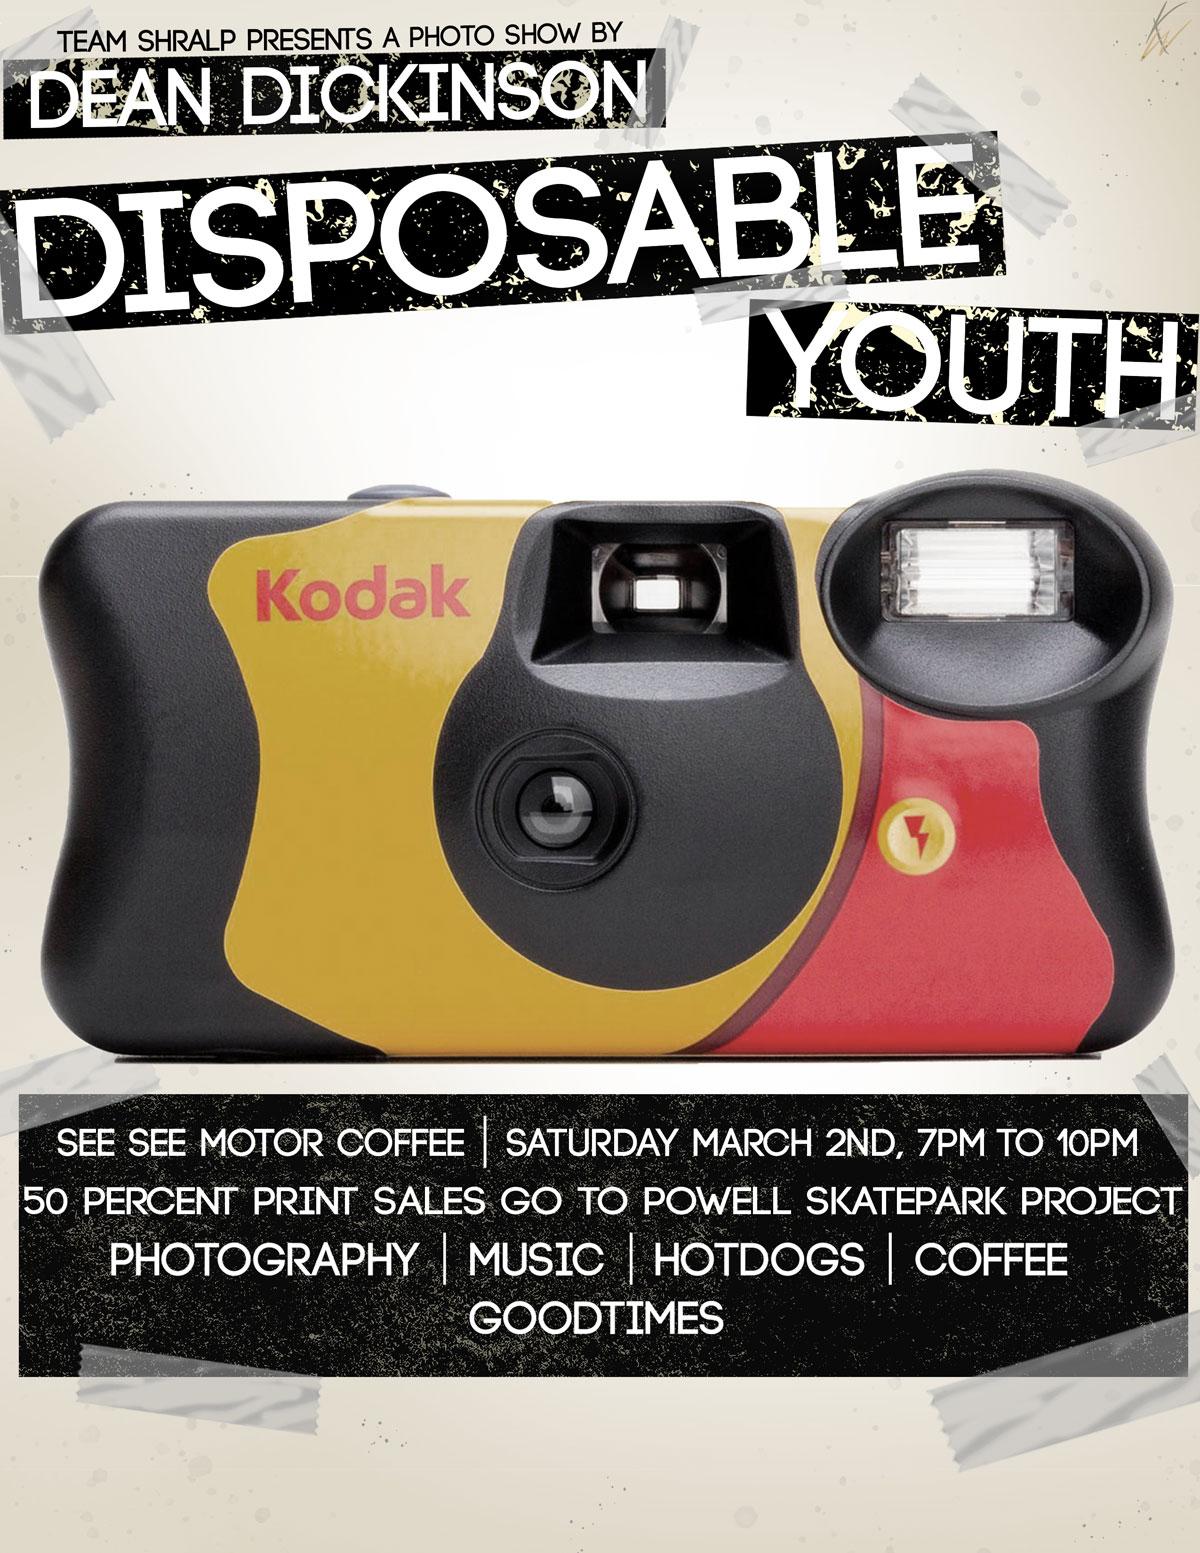 Dean Dickinson Disposable Youth photo show BMX